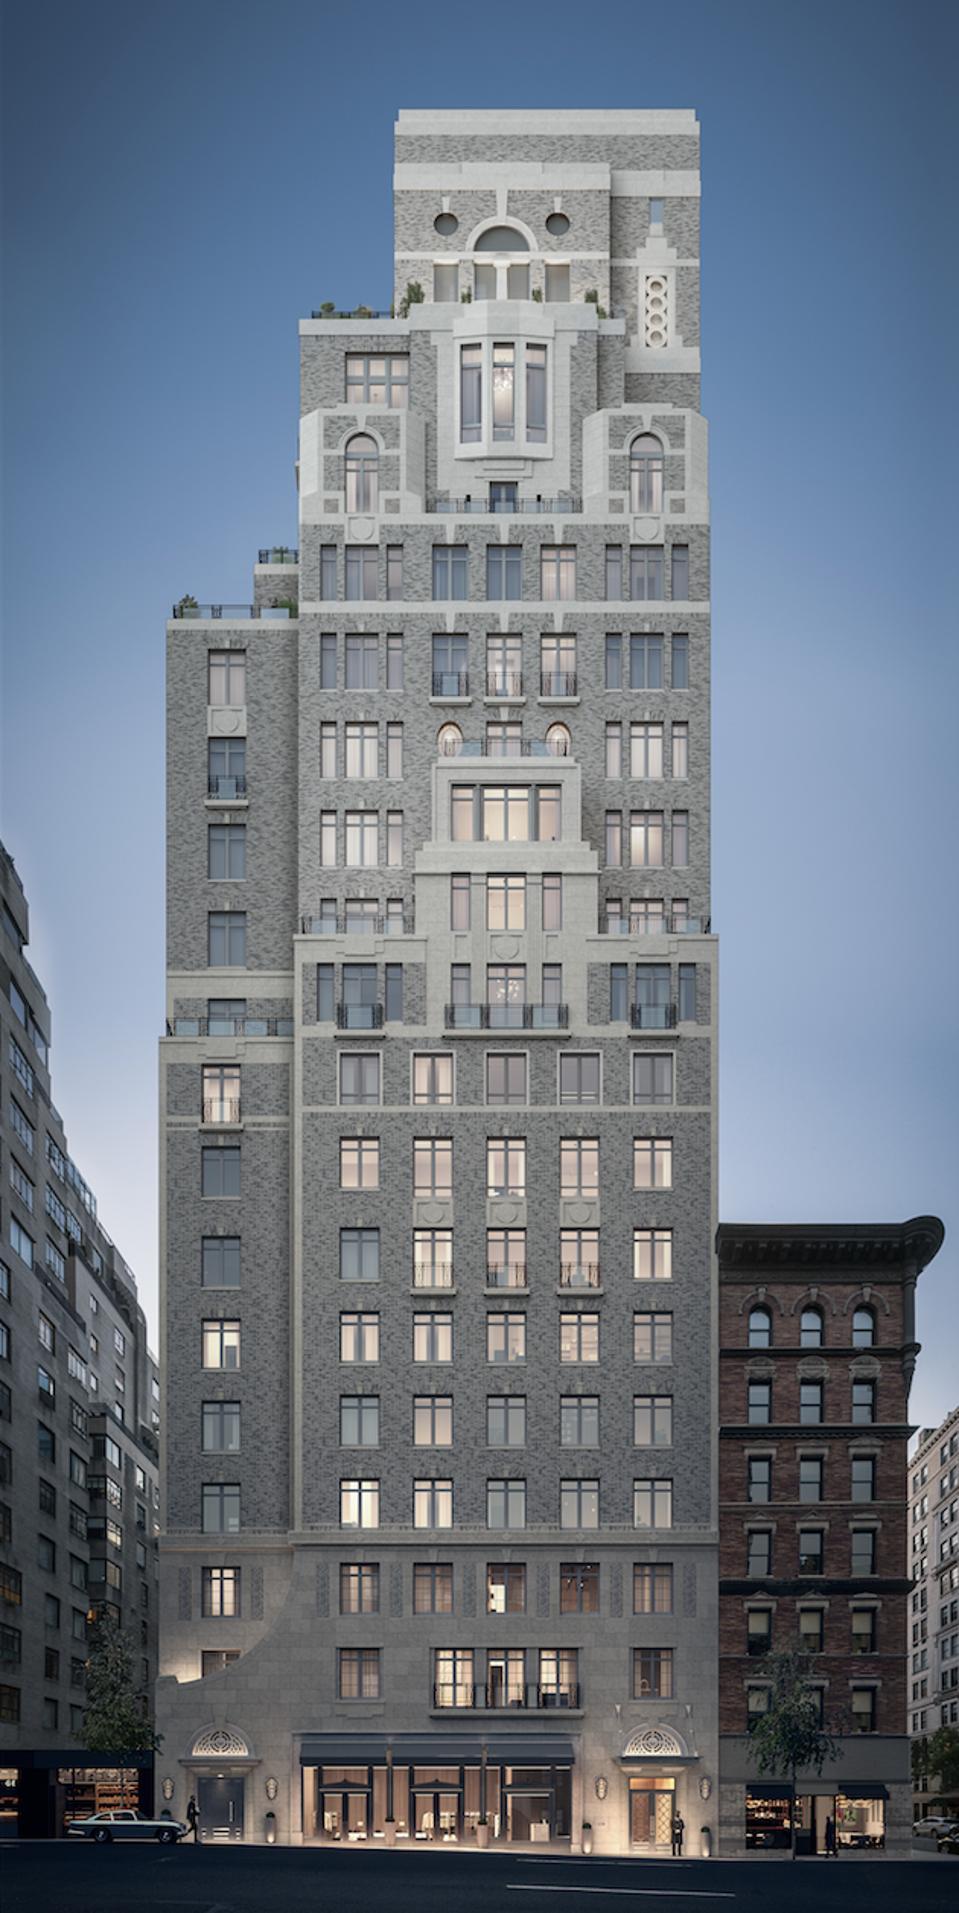 1228 Madison Avenue, New York, Carnegie Hill, Robert A.M. Stern Architects, CBSH Ironstate